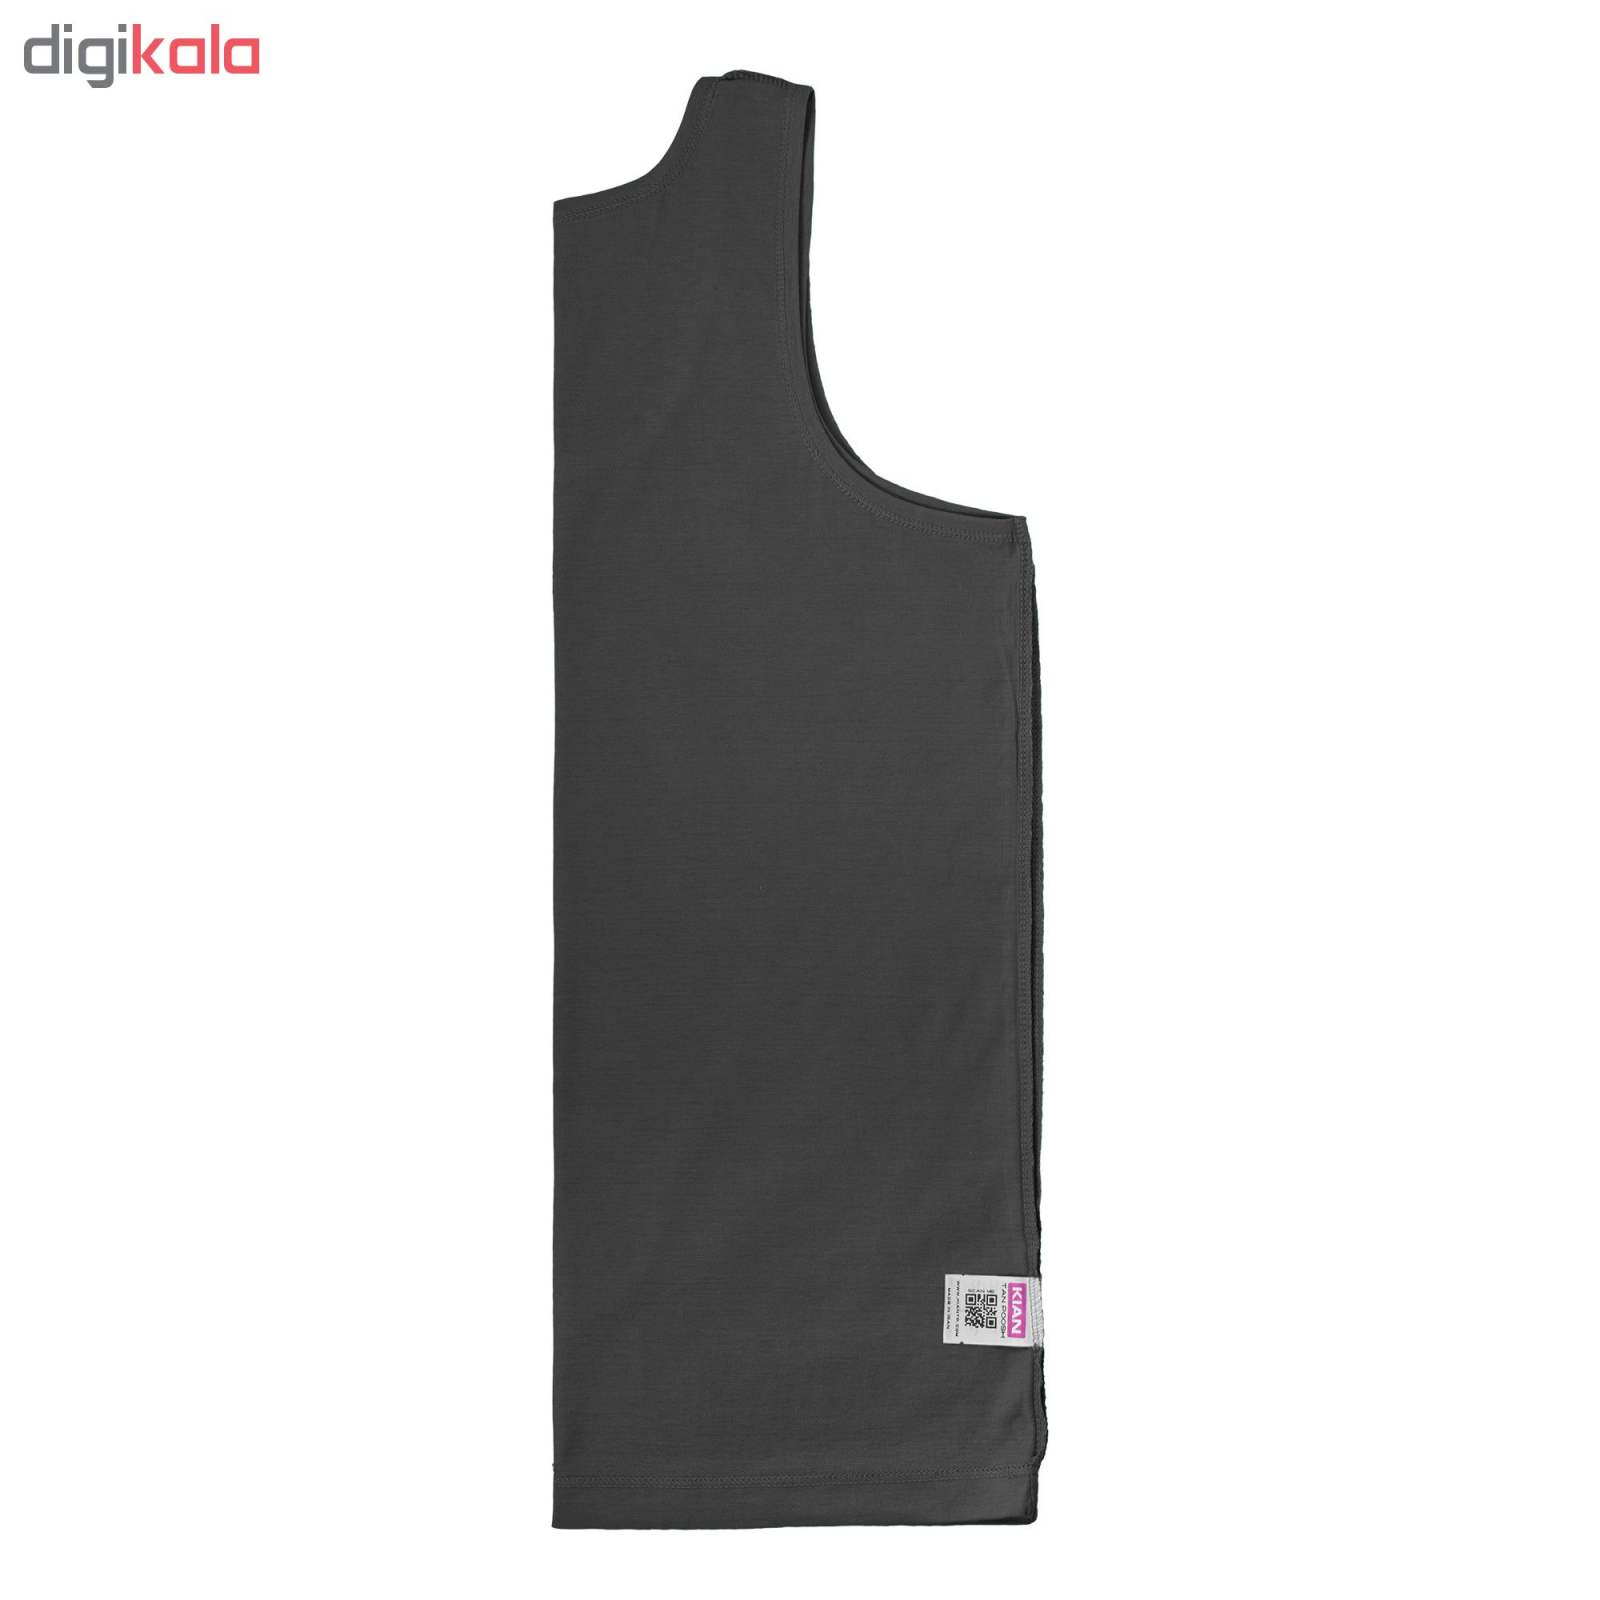 زیرپوش رکابی مردانه کیان تن پوش مدل A Shirt Classic LG main 1 2